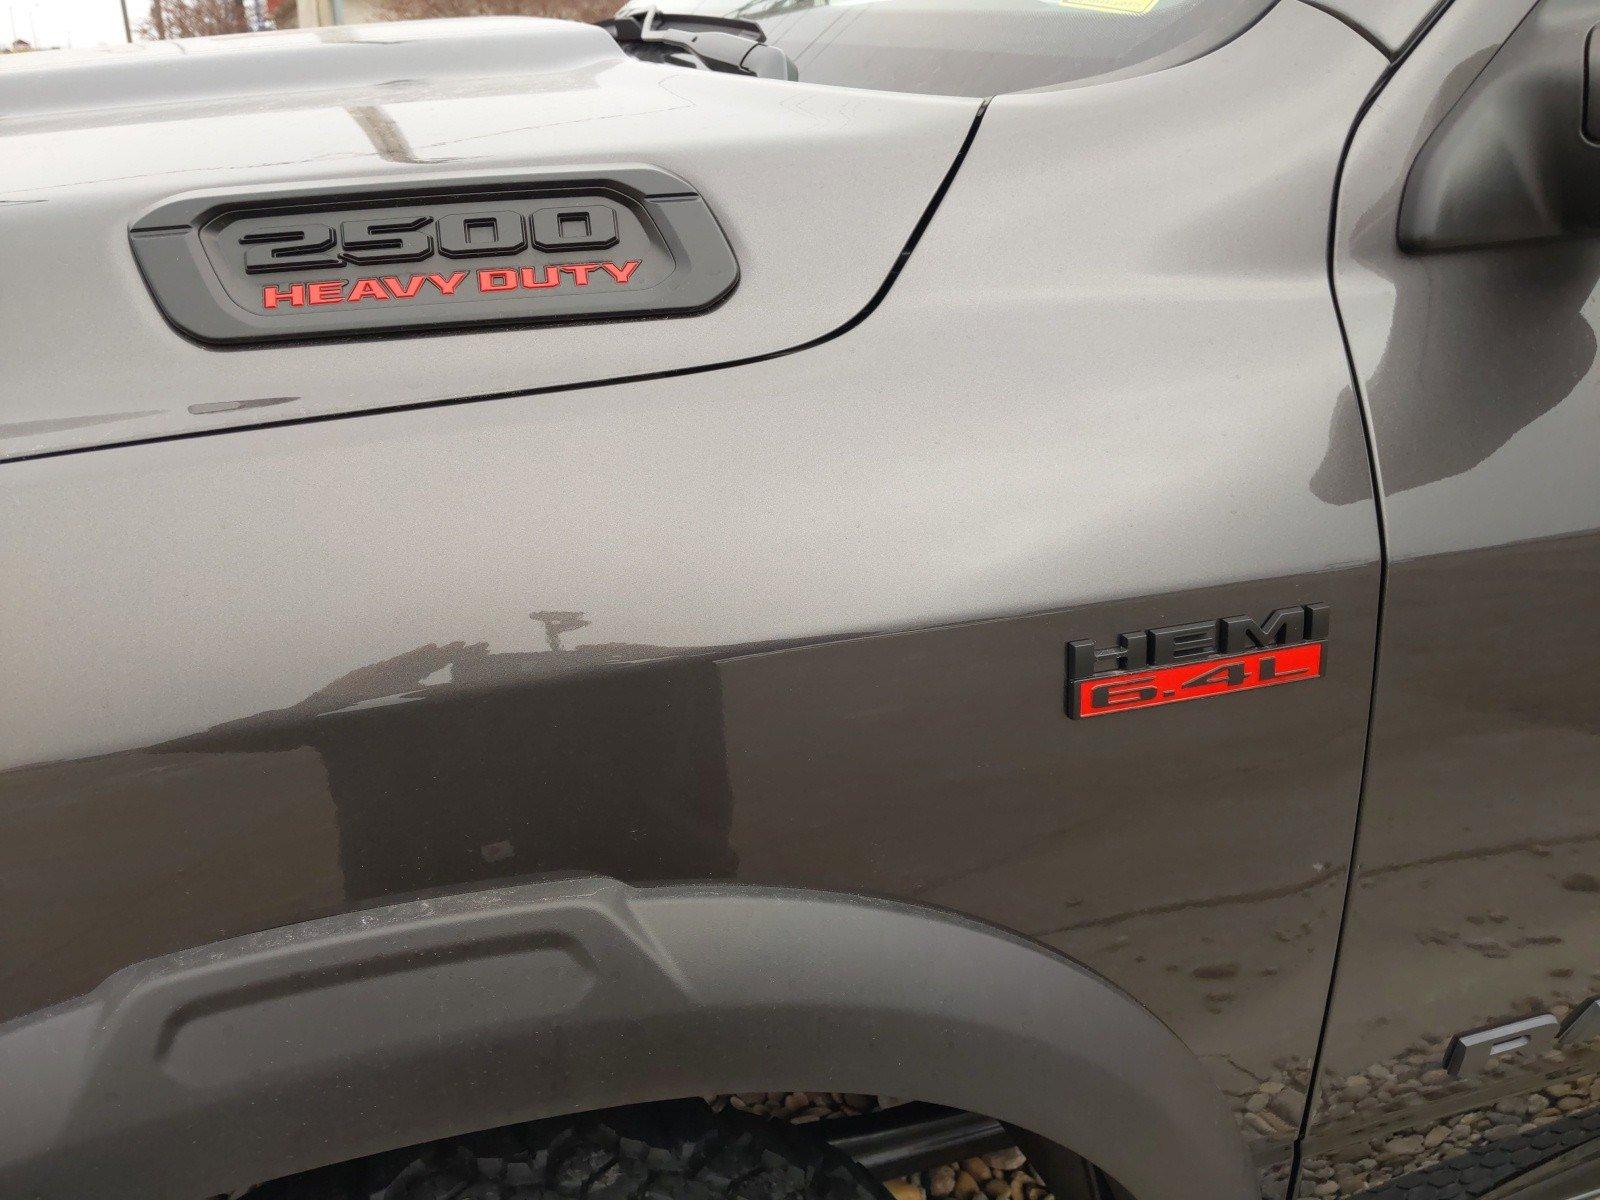 New 2020 Ram 2500 Power Wagon Crew Cab Pickup for sale in Grand Island NE